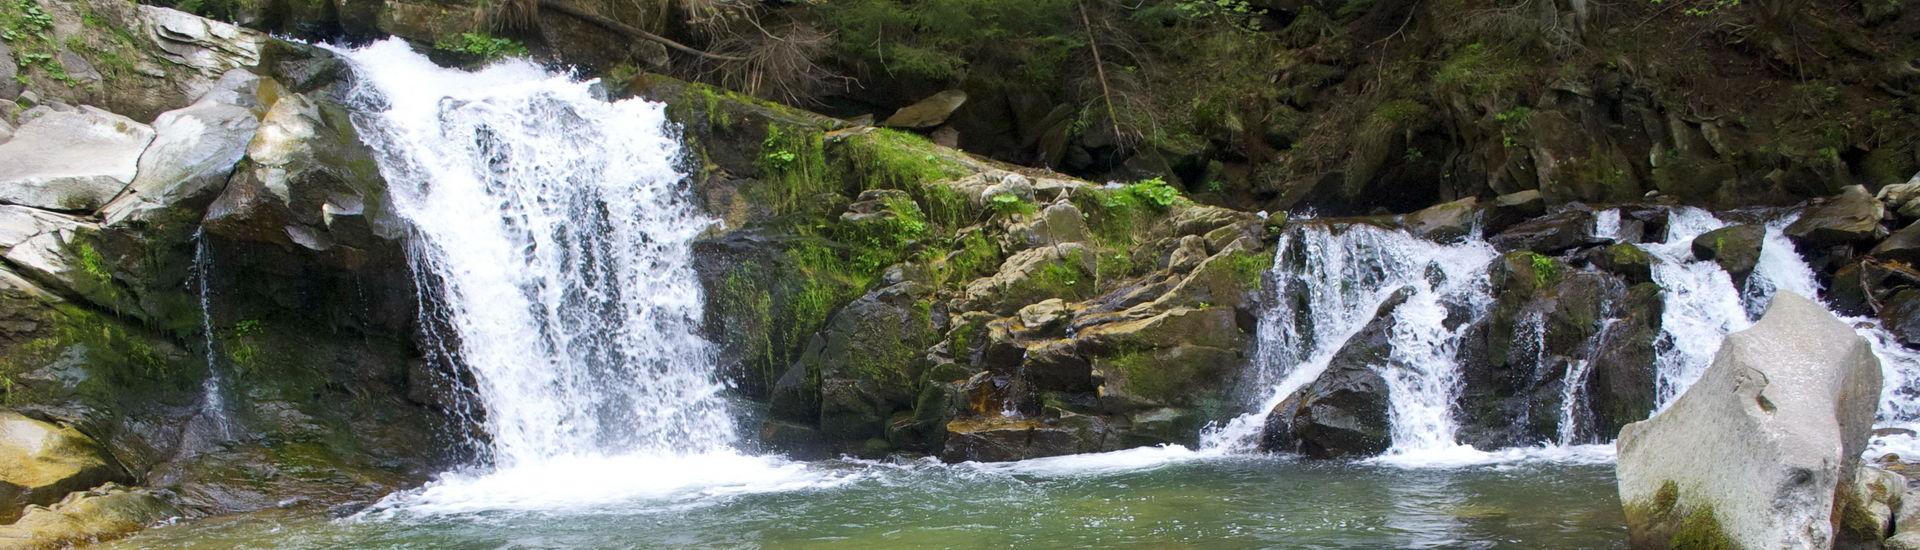 Маршрут на гору Ключ, Кам'янецький водоспад